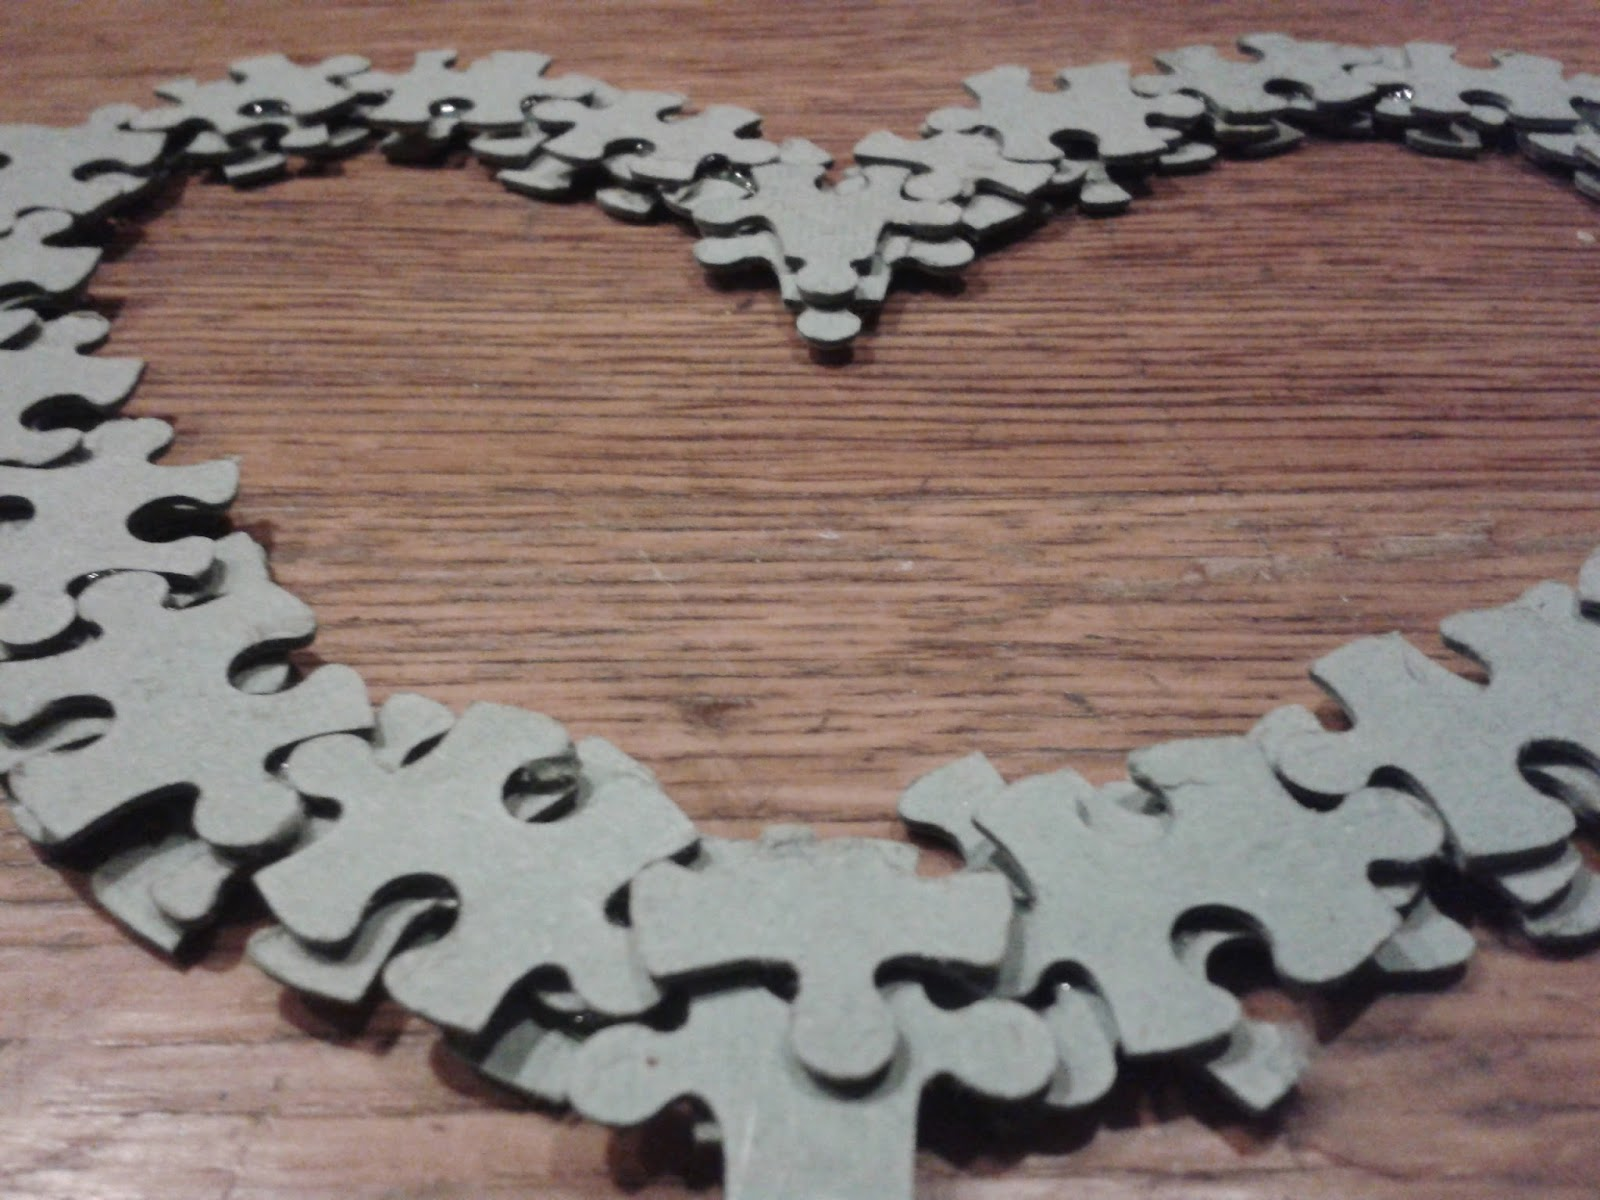 2014 03 18+20.24.55 - Hartje van puzzels